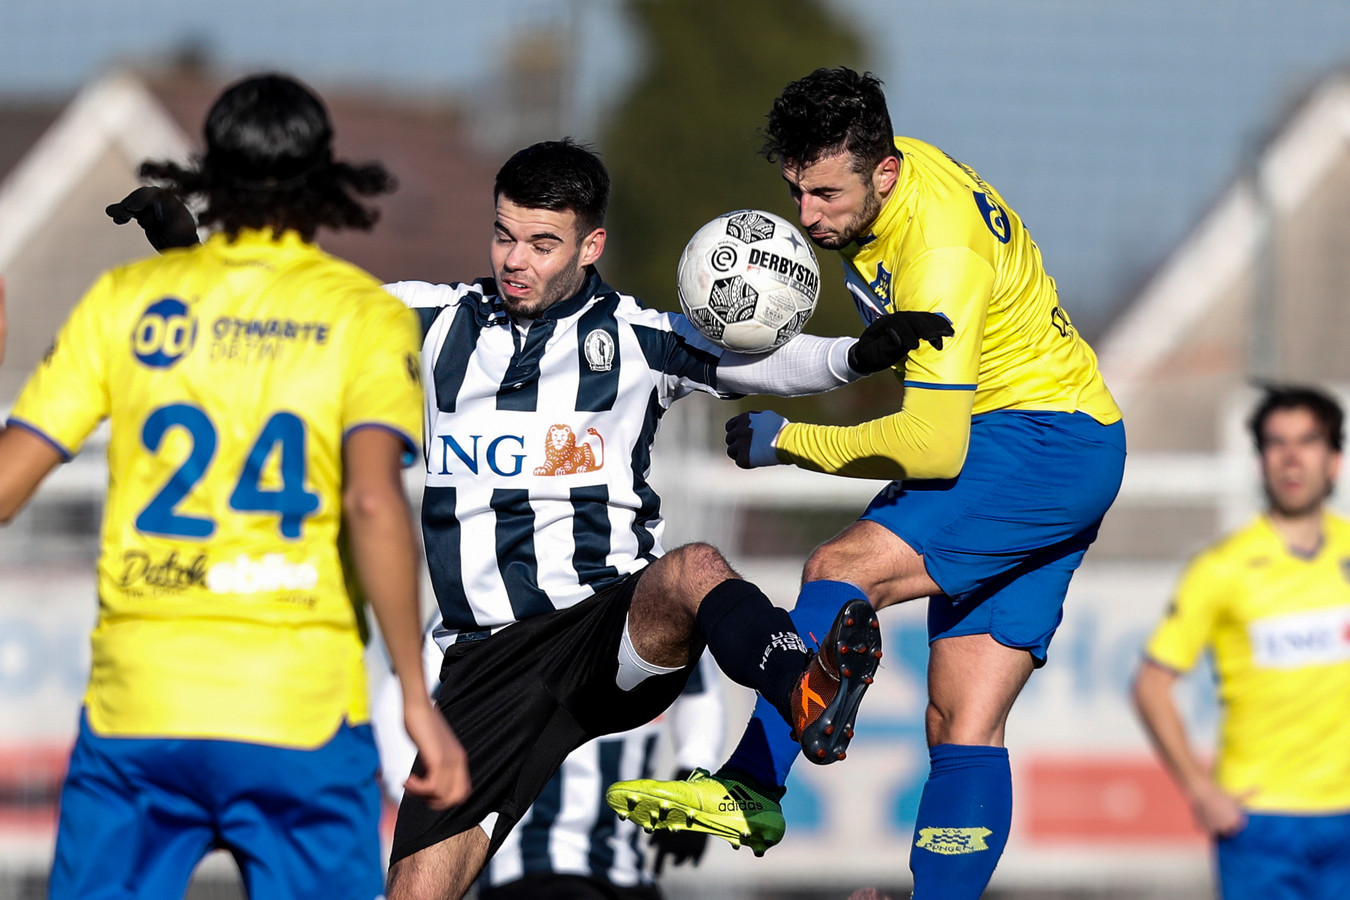 20-01-2019: Voetbal: Dongen v Hercules: Dongen Derde Divisie seizoen 2018-2019  L-R Conner Blöte (midden, Hercules), Oguzam Kazanci (Dongen)